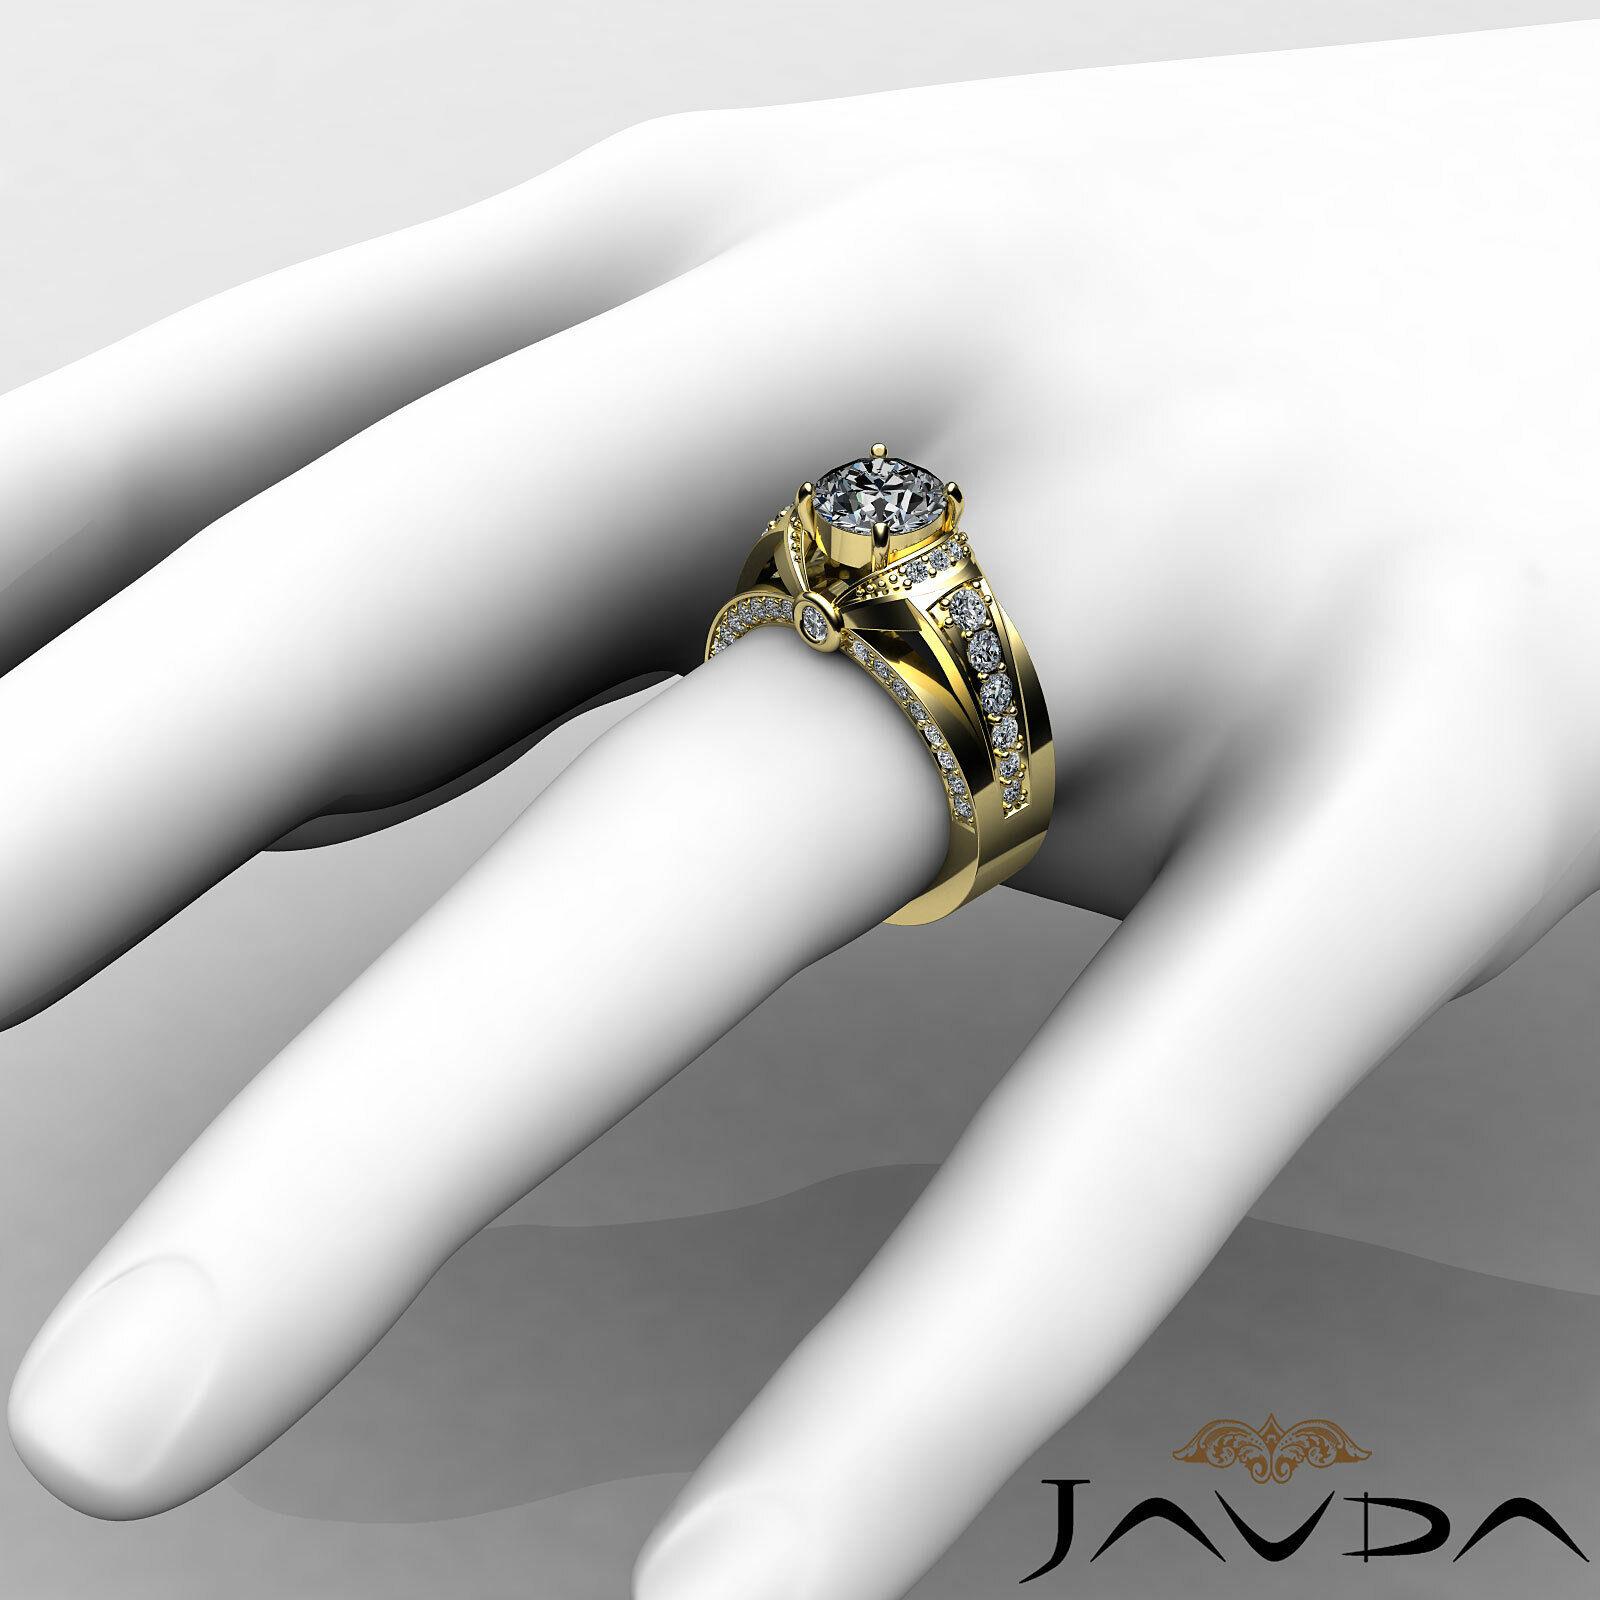 1.7ct Knot Classic Sidestone Round Diamond Engagement Ring GIA H-VVS2 White Gold 10